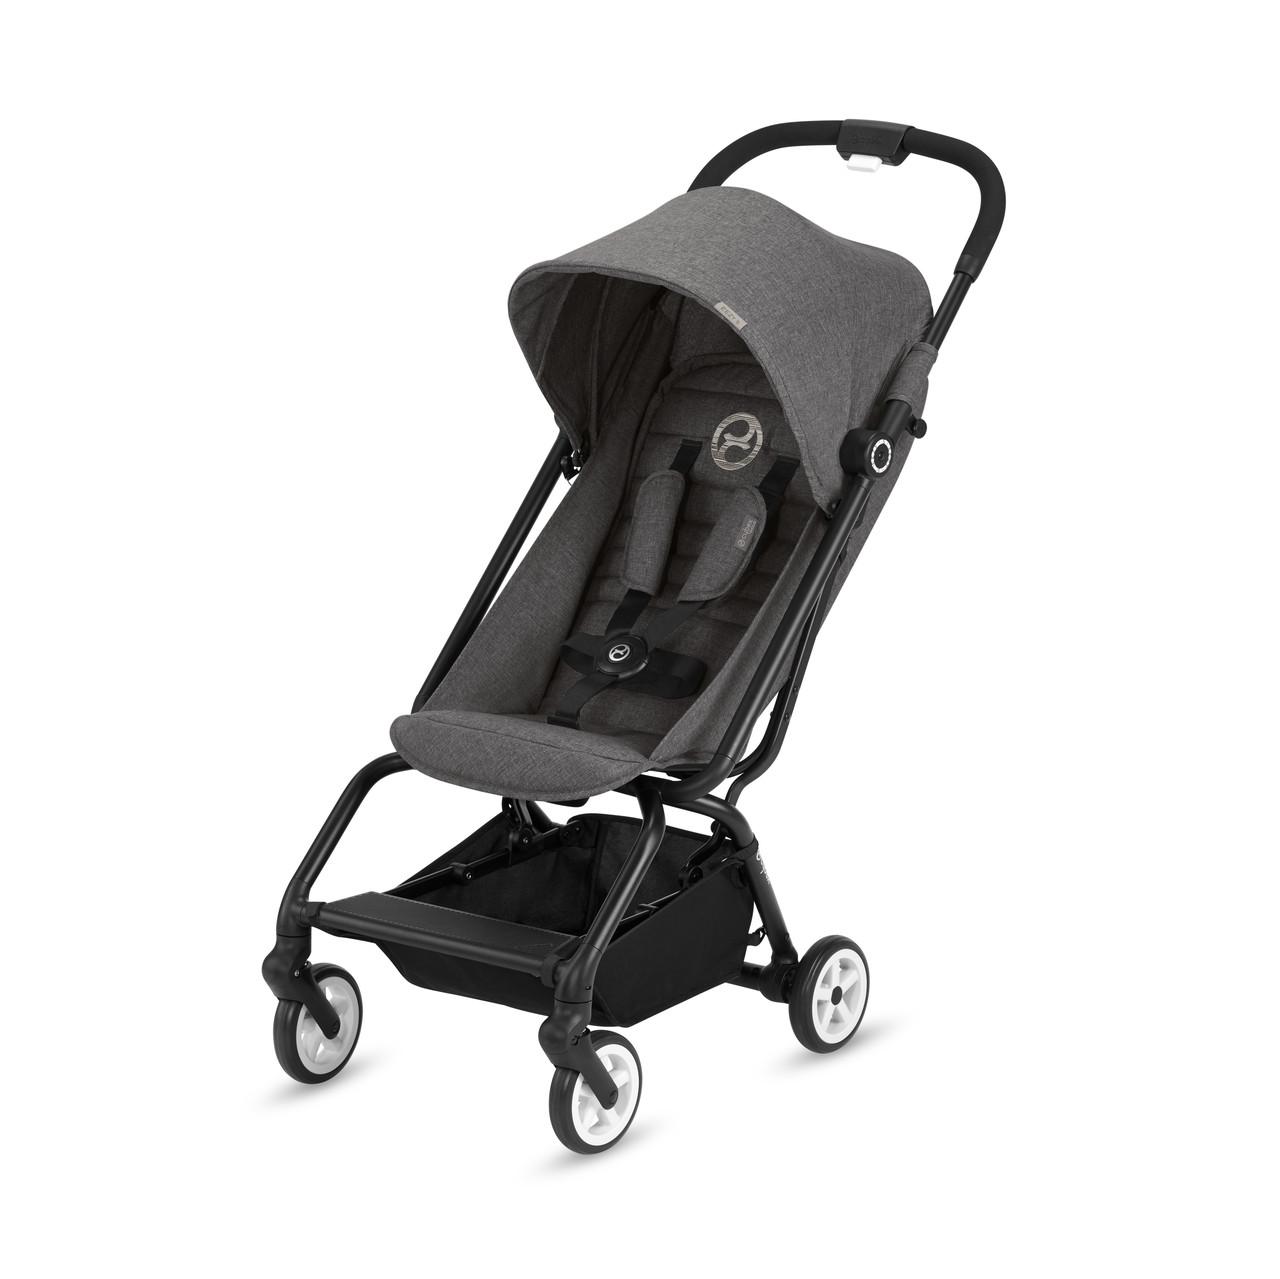 Cybex - Прогулочная коляска Eezy S, цвет Manhattan Grey